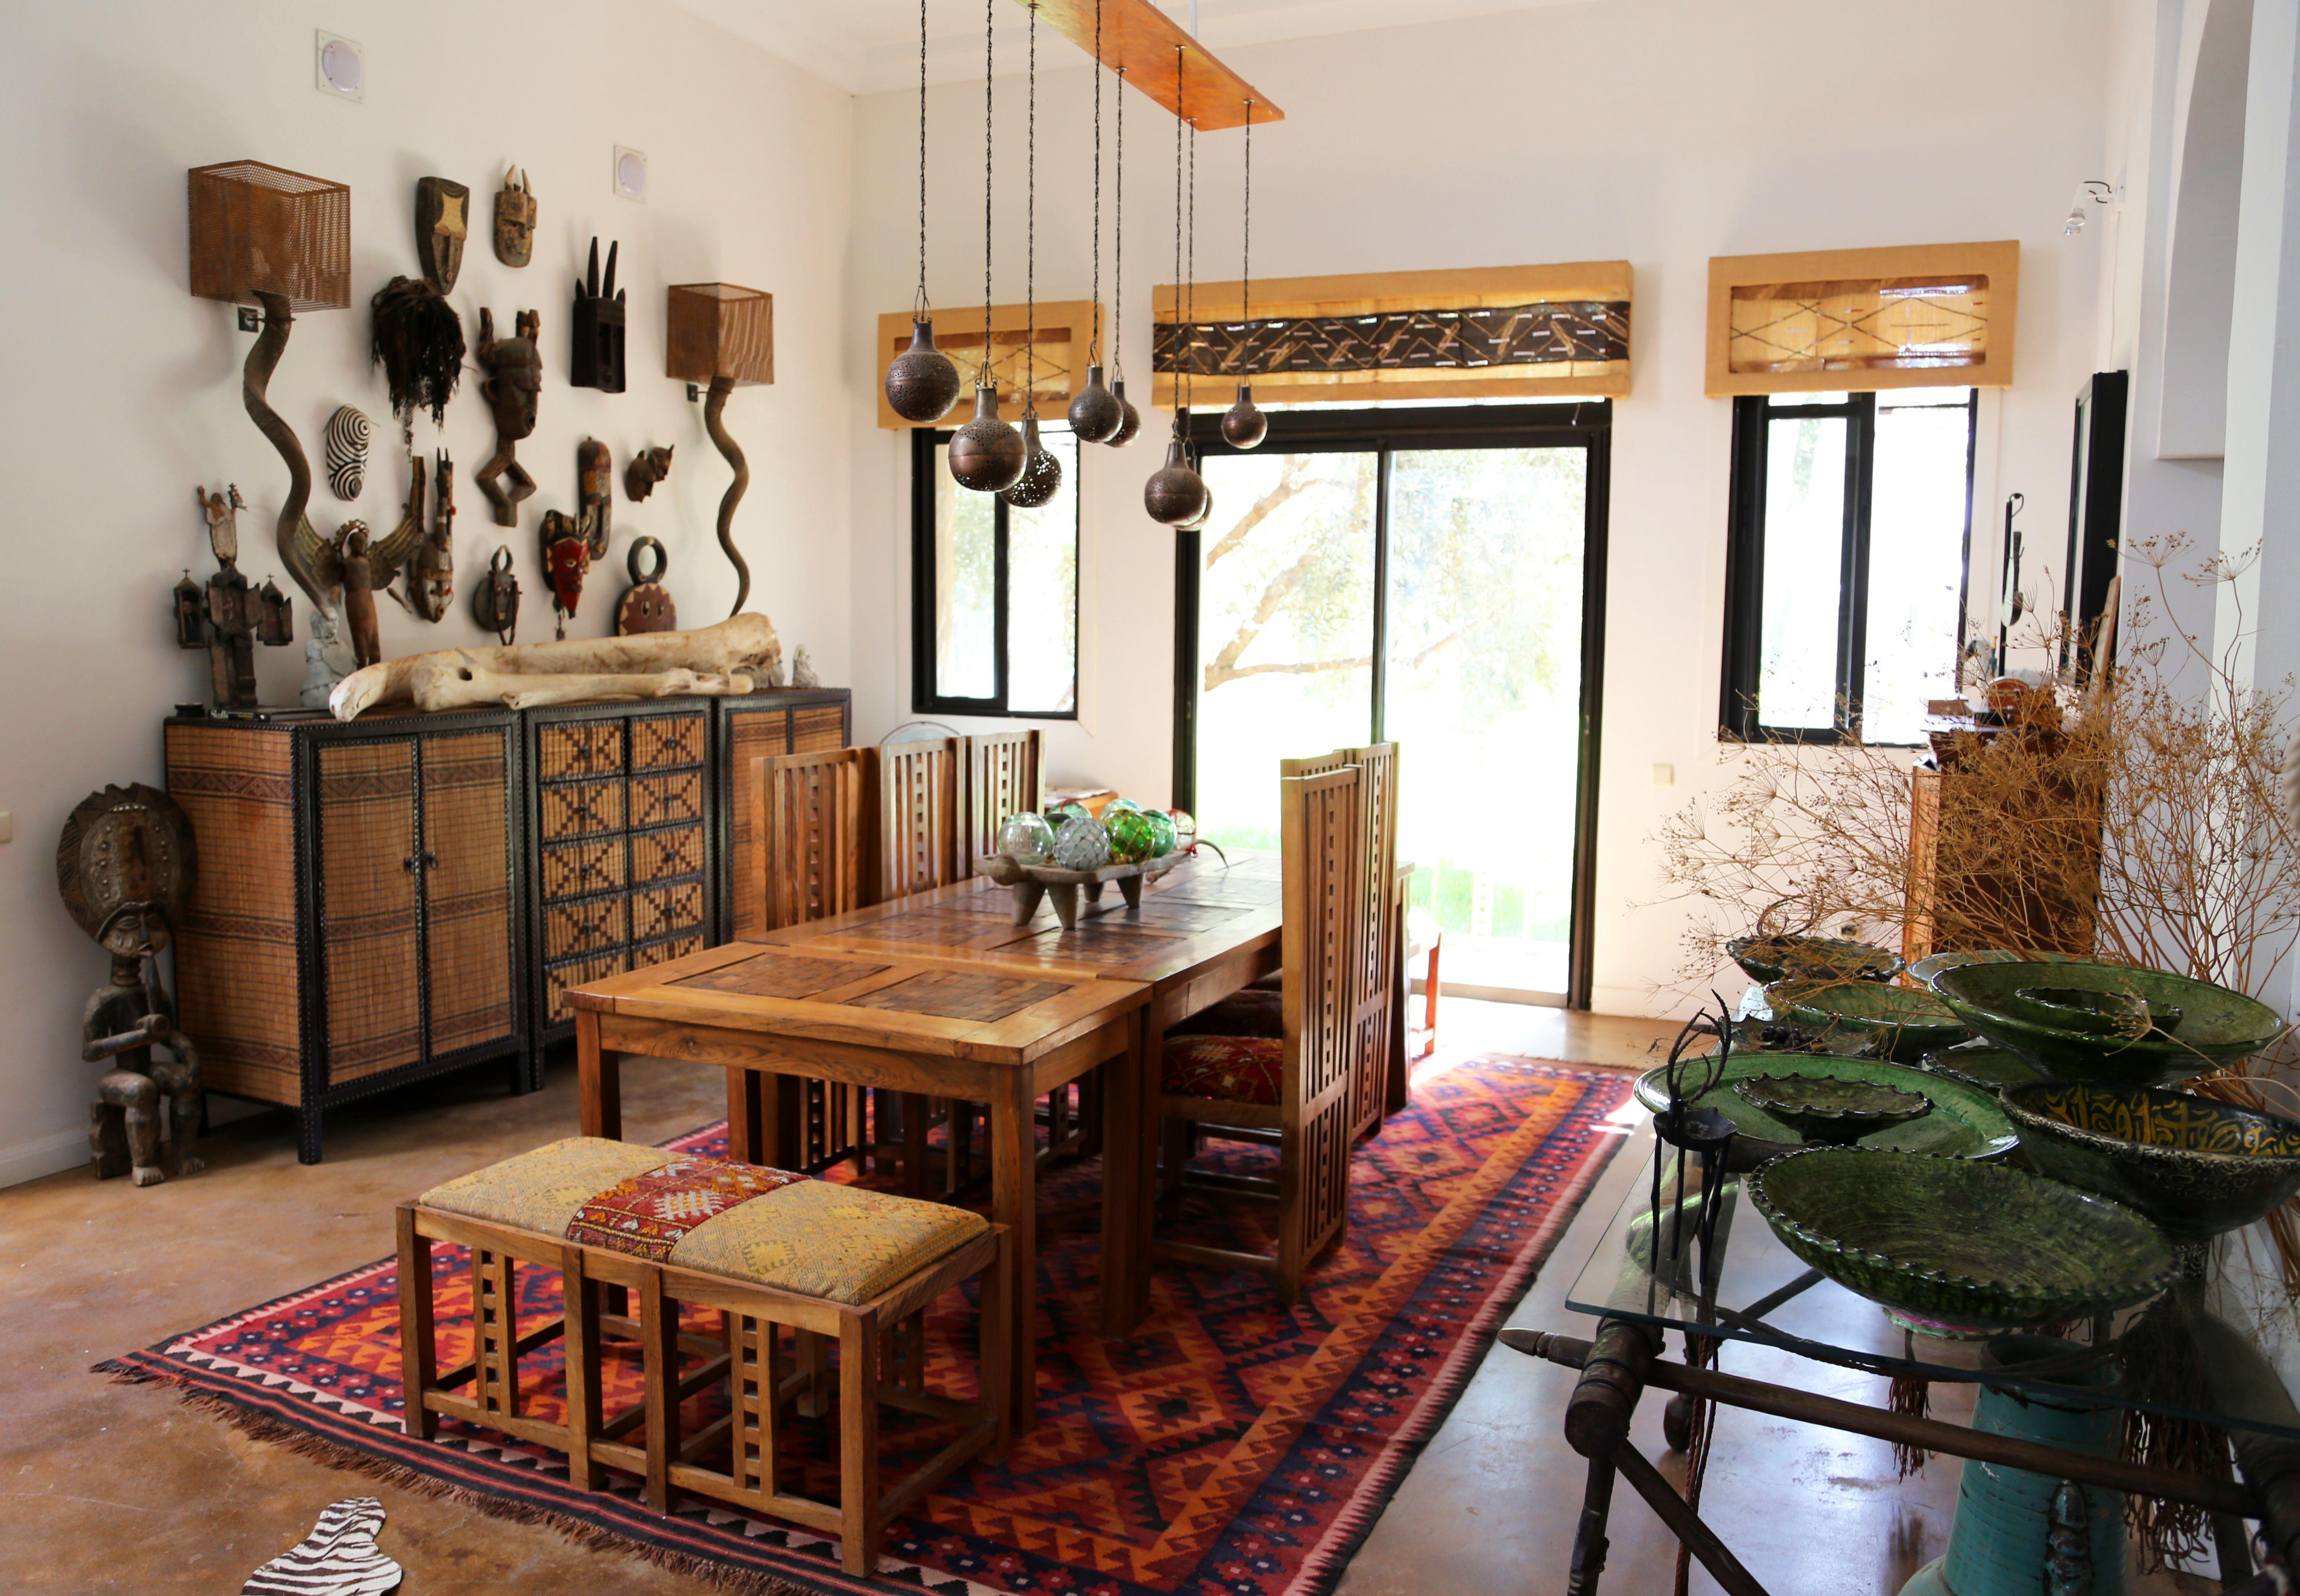 Peacock Pavilions: Marrakesh Global Design Oasis